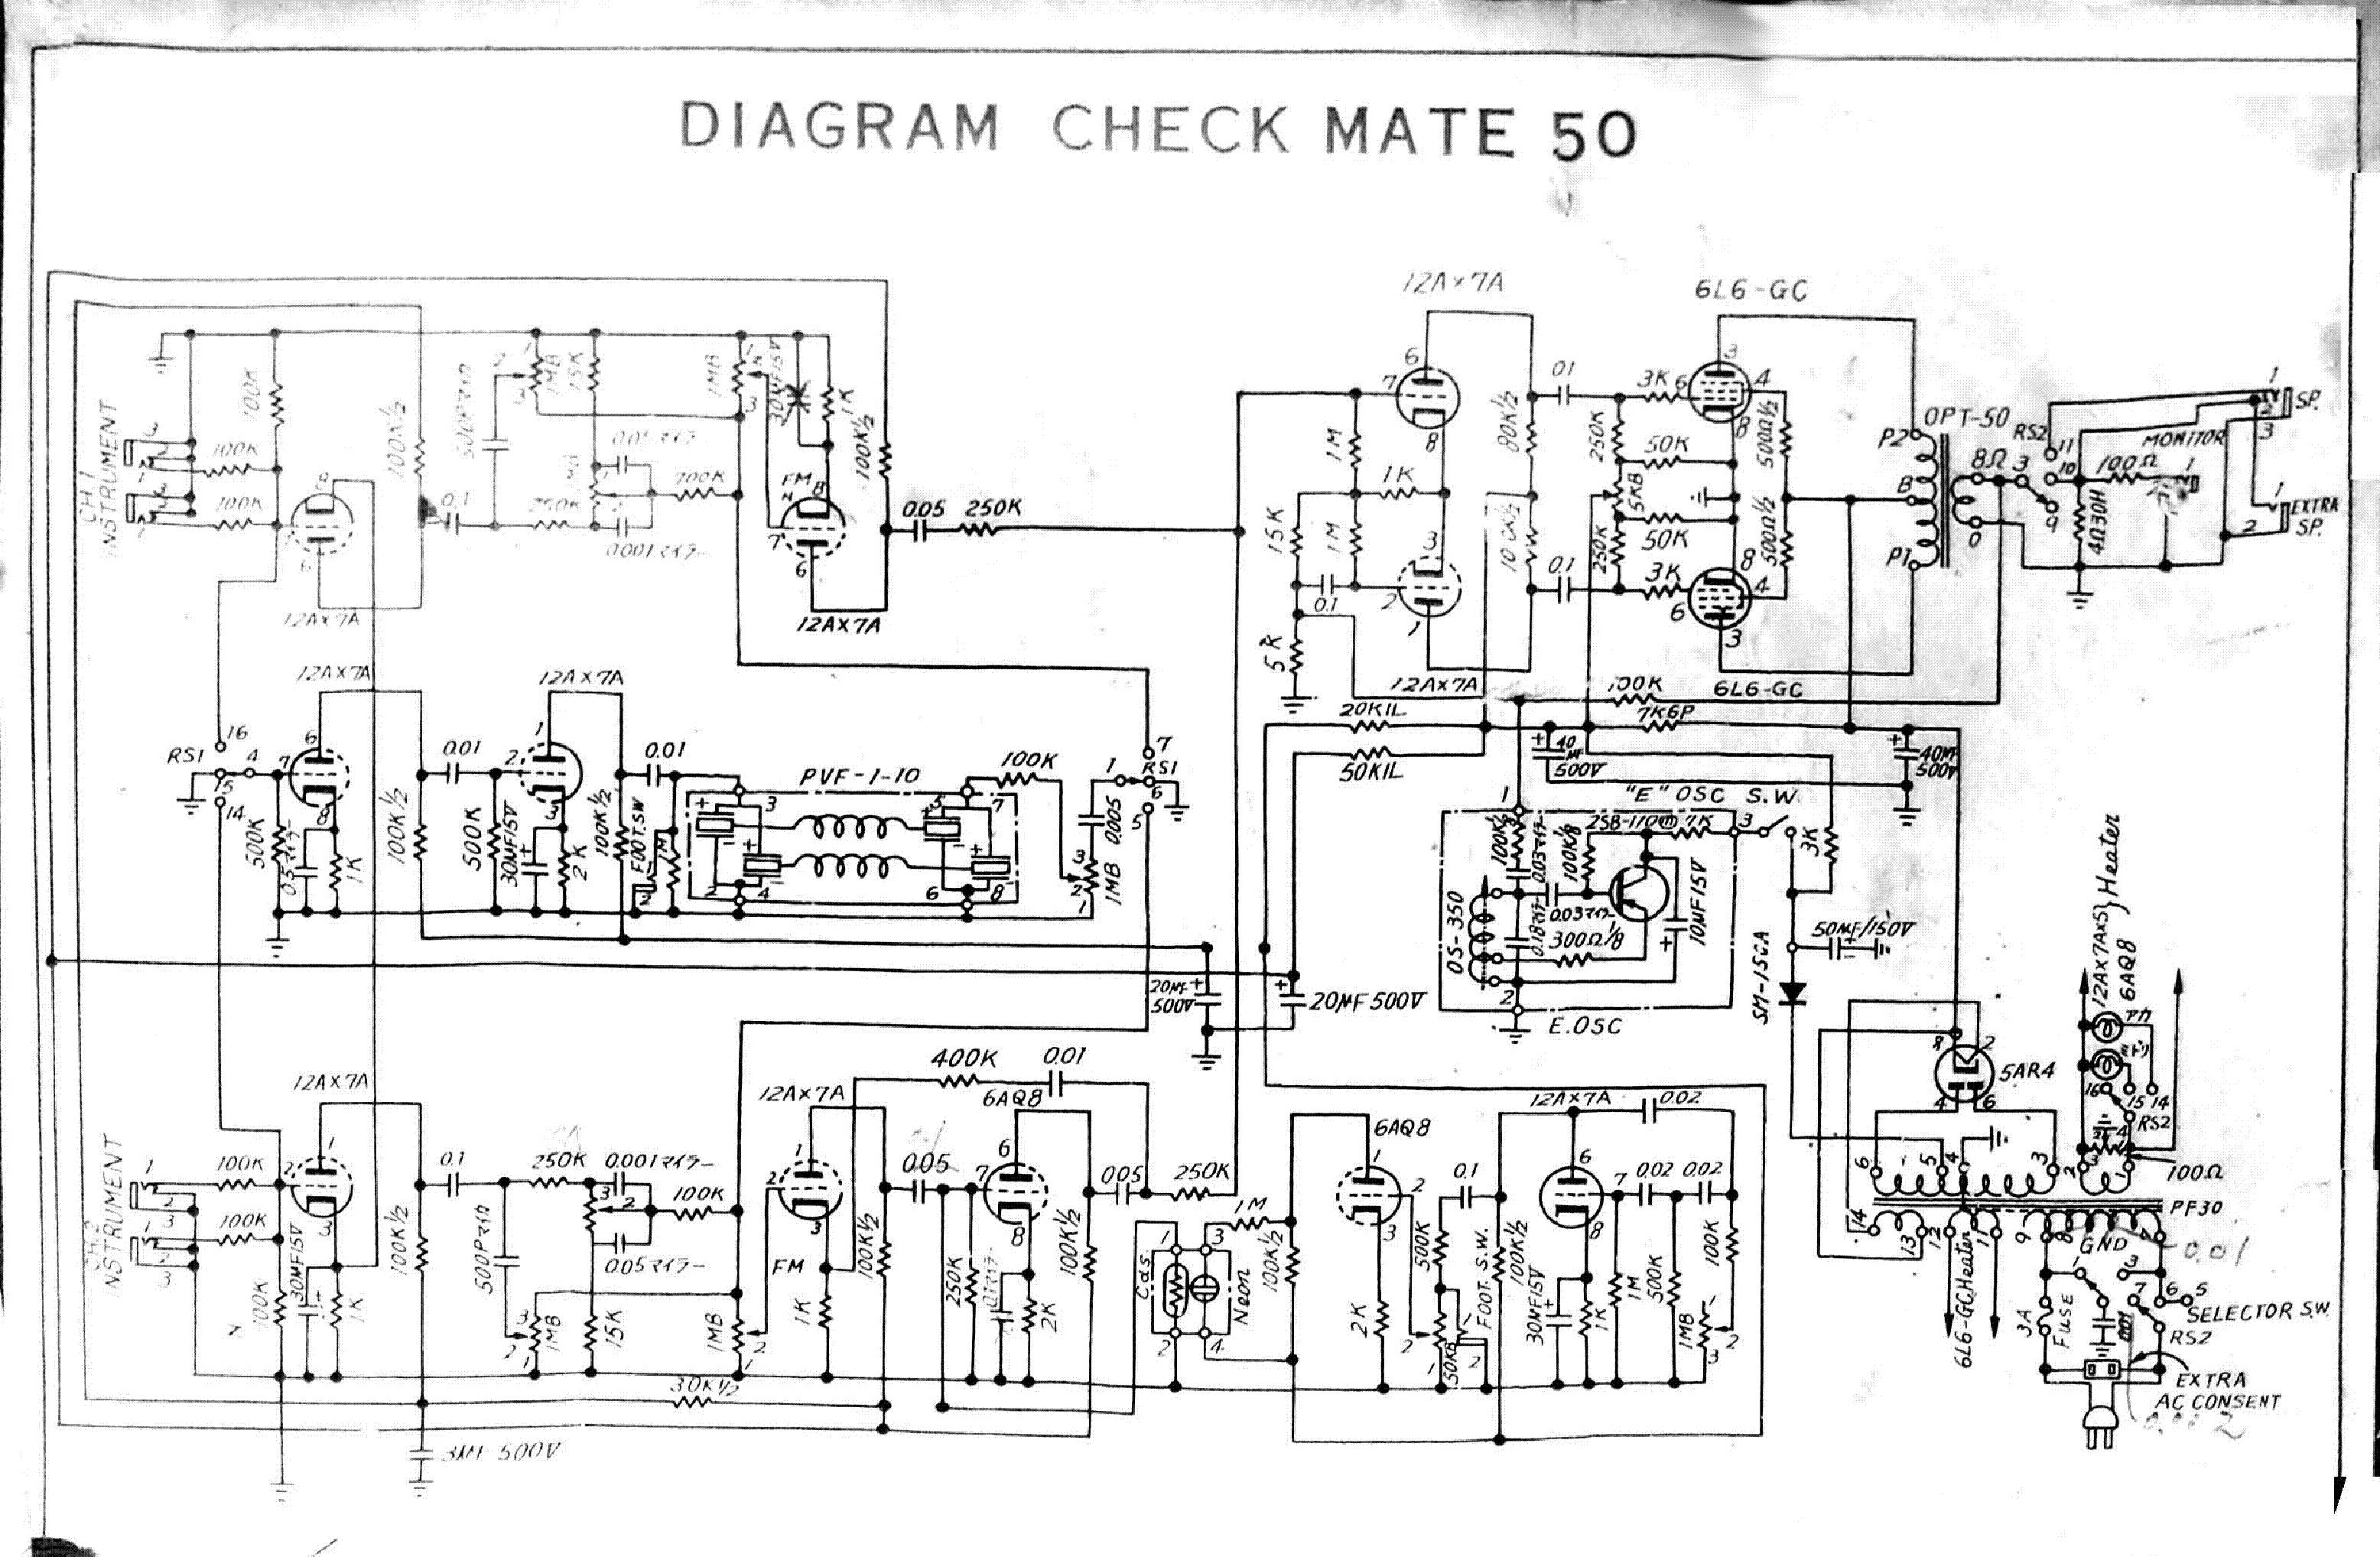 Teisco Wiring Diagrams Diagram Schematics Electra Guitar Guitars Trusted Olp Del